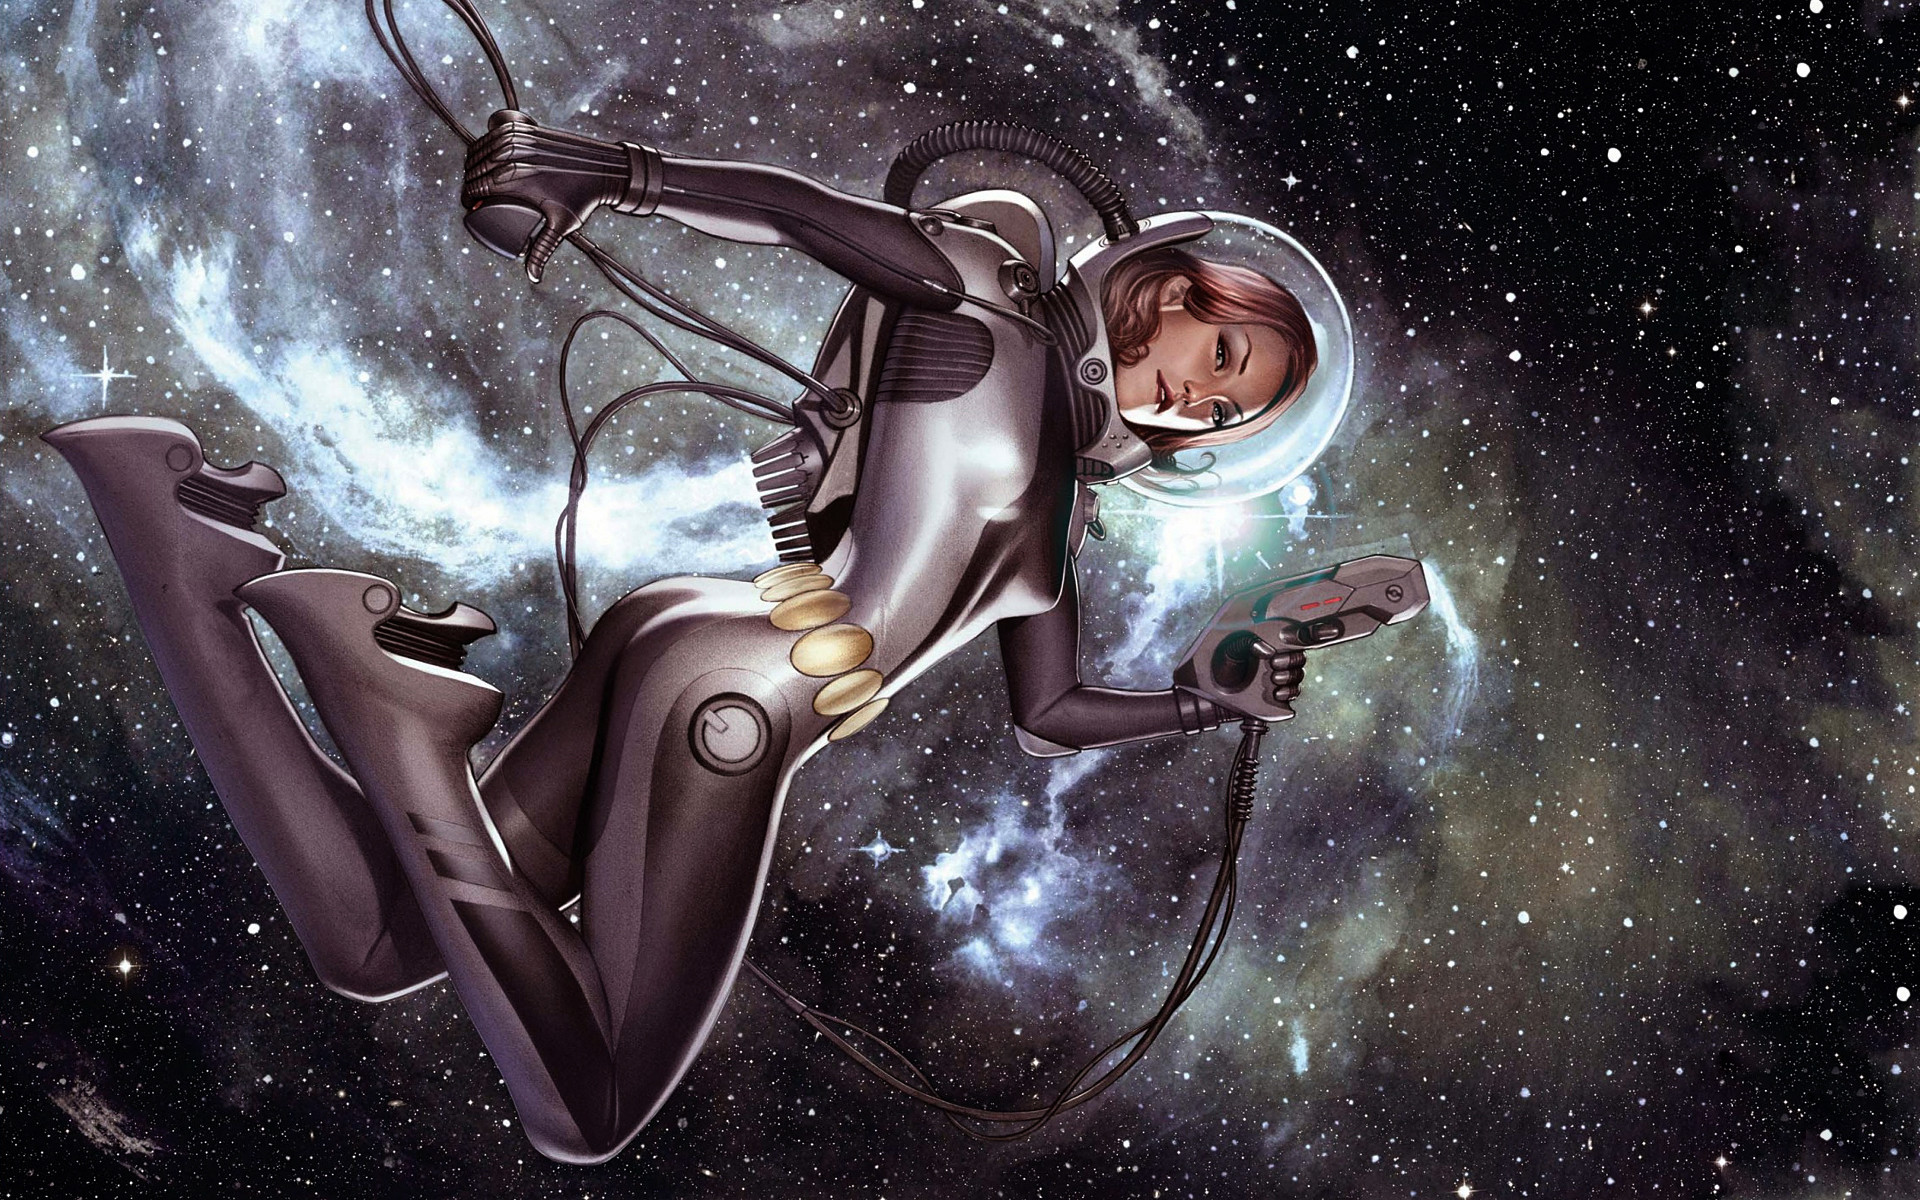 Sci Fi – Women Warrior Retro Pistol Spacesuit Girls & Guns Adventure  Wallpaper